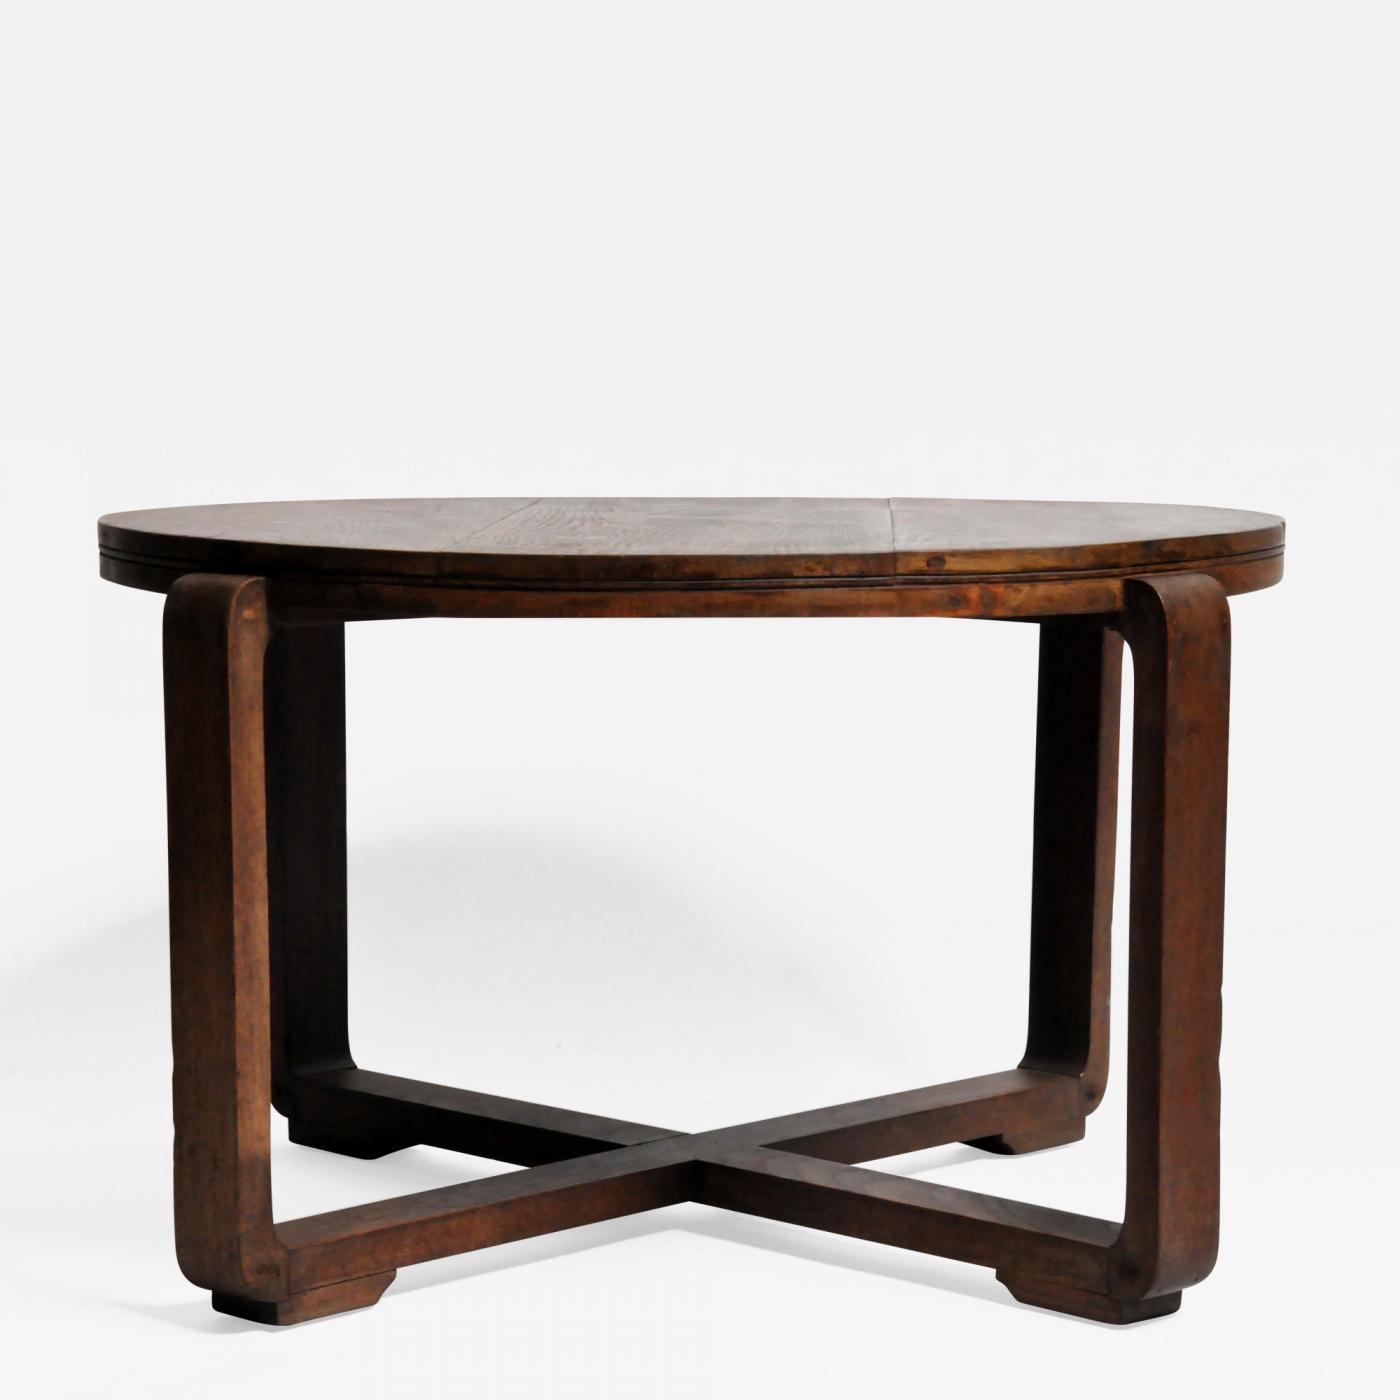 British Colonial Art Deco Tea Table